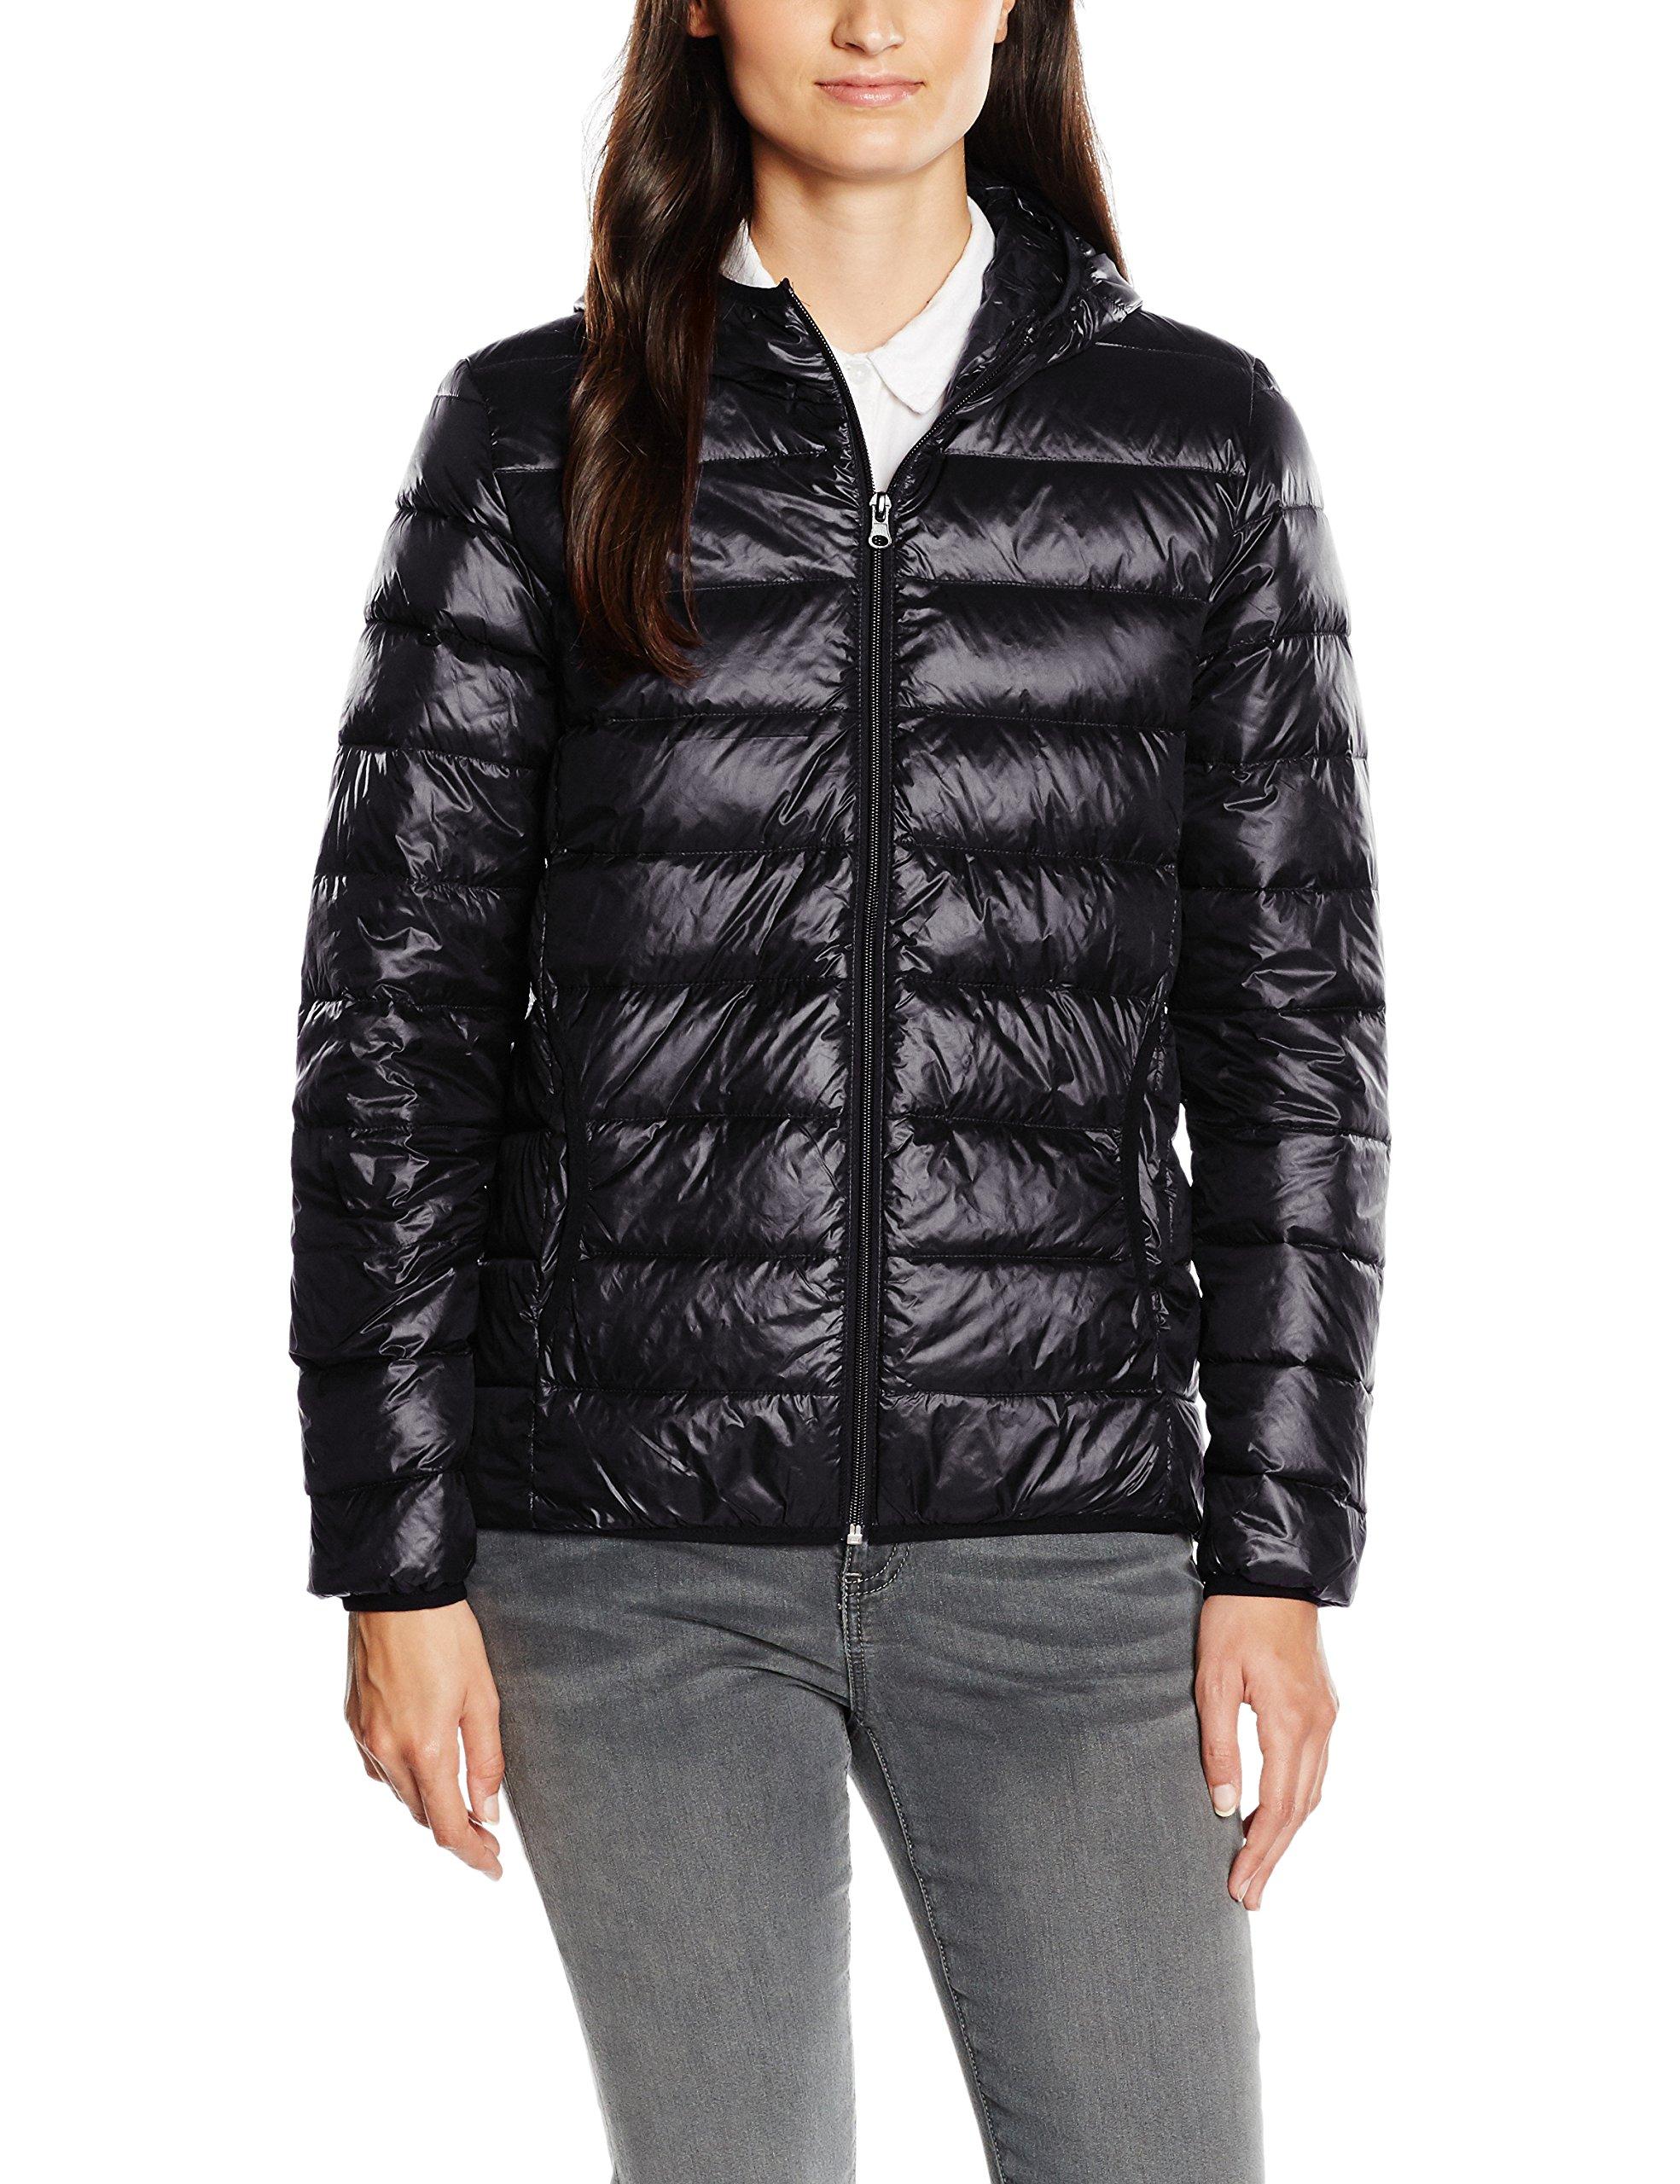 6009640 Inchestaille Fransa 1 Noirblack Jacket Calight Blouson FabricantLFemme K1FTlJc